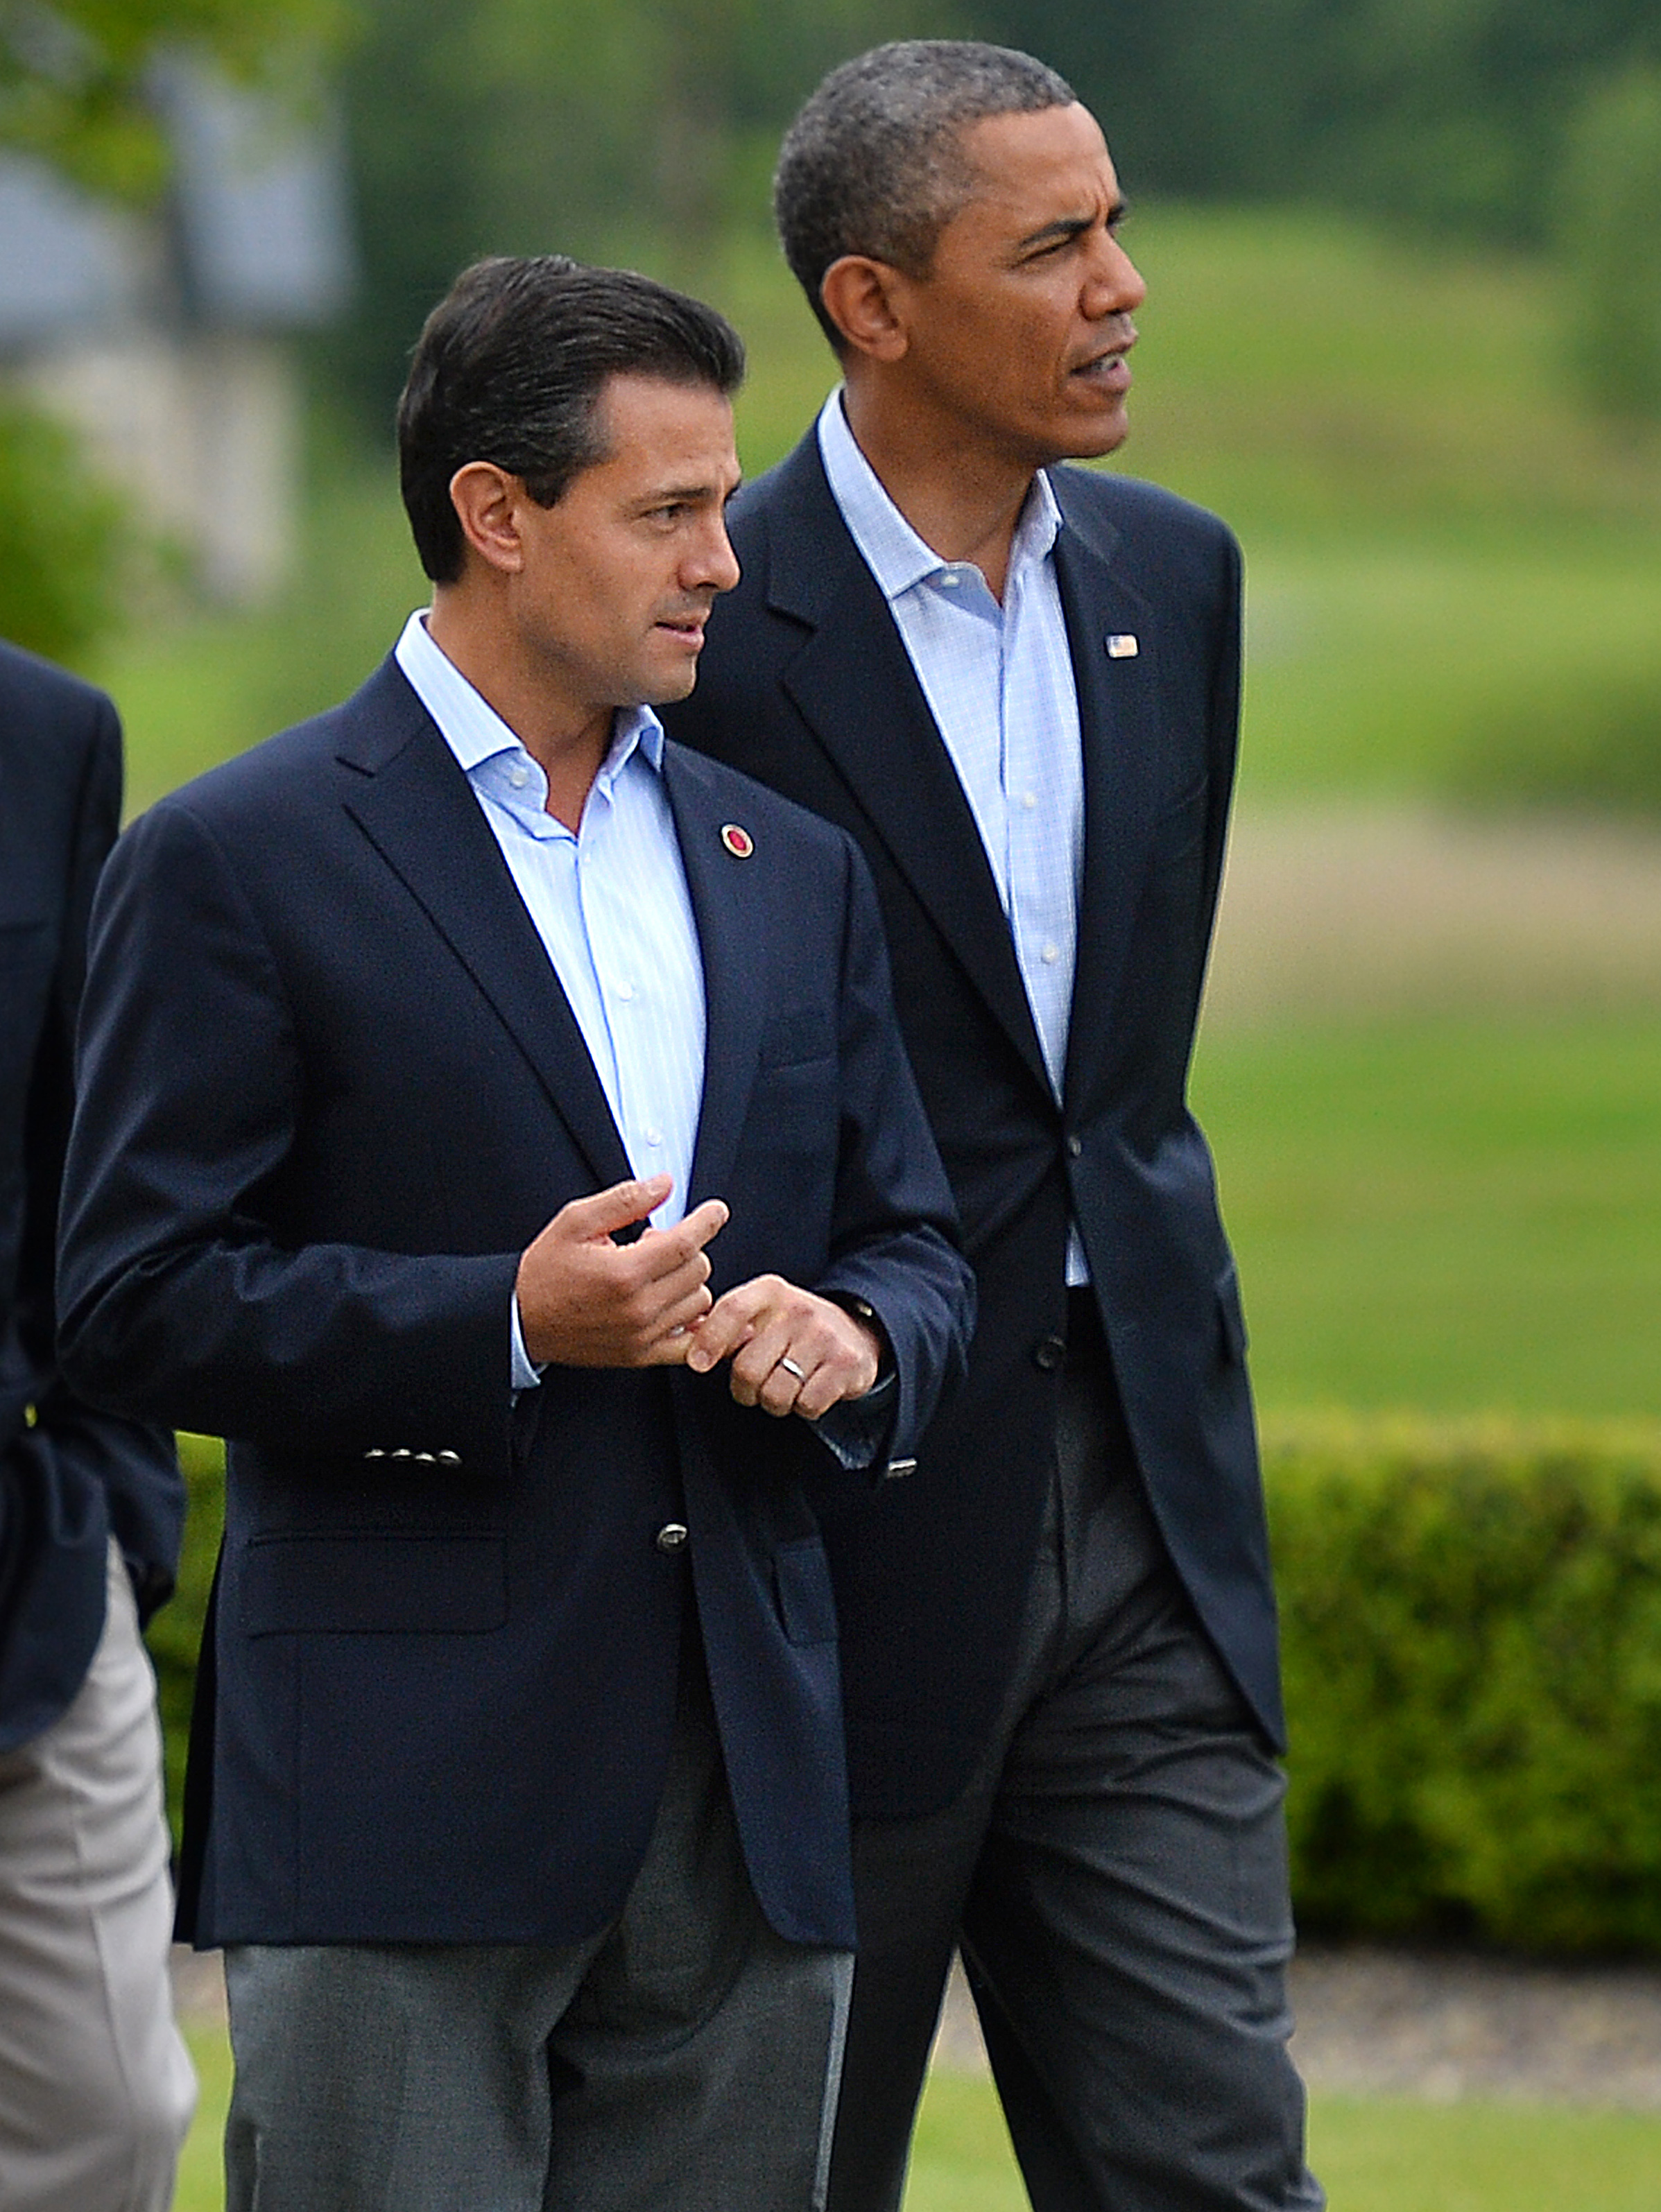 Mexico Summons U.S. Ambassador, Seeking Answers To Spying Claims